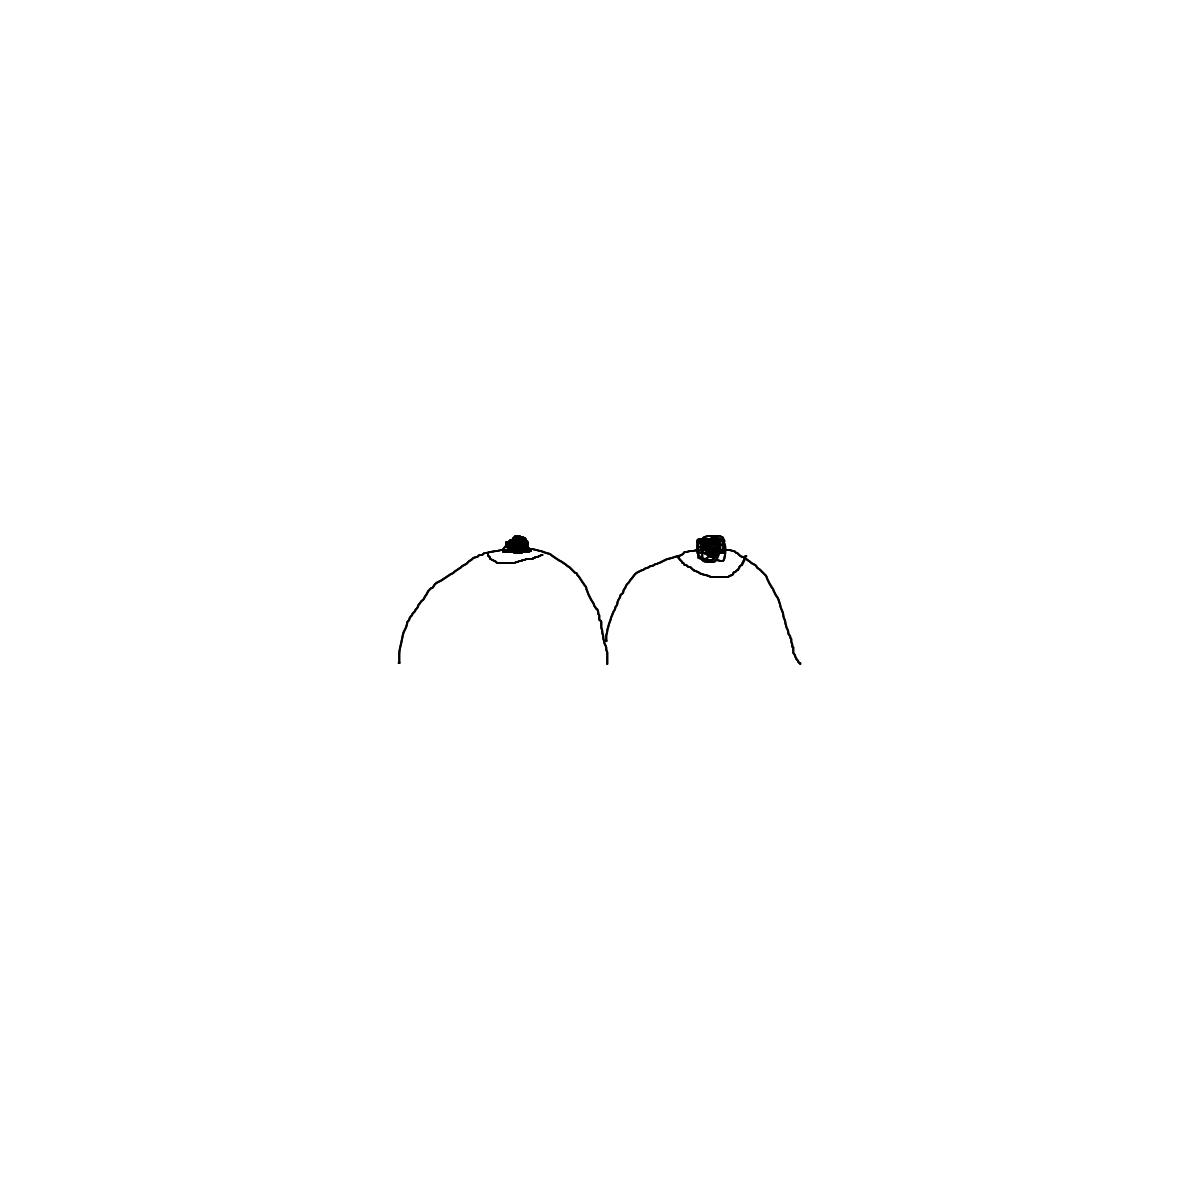 BAAAM drawing#2887 lat:52.2330322265625000lng: 21.0024414062500000